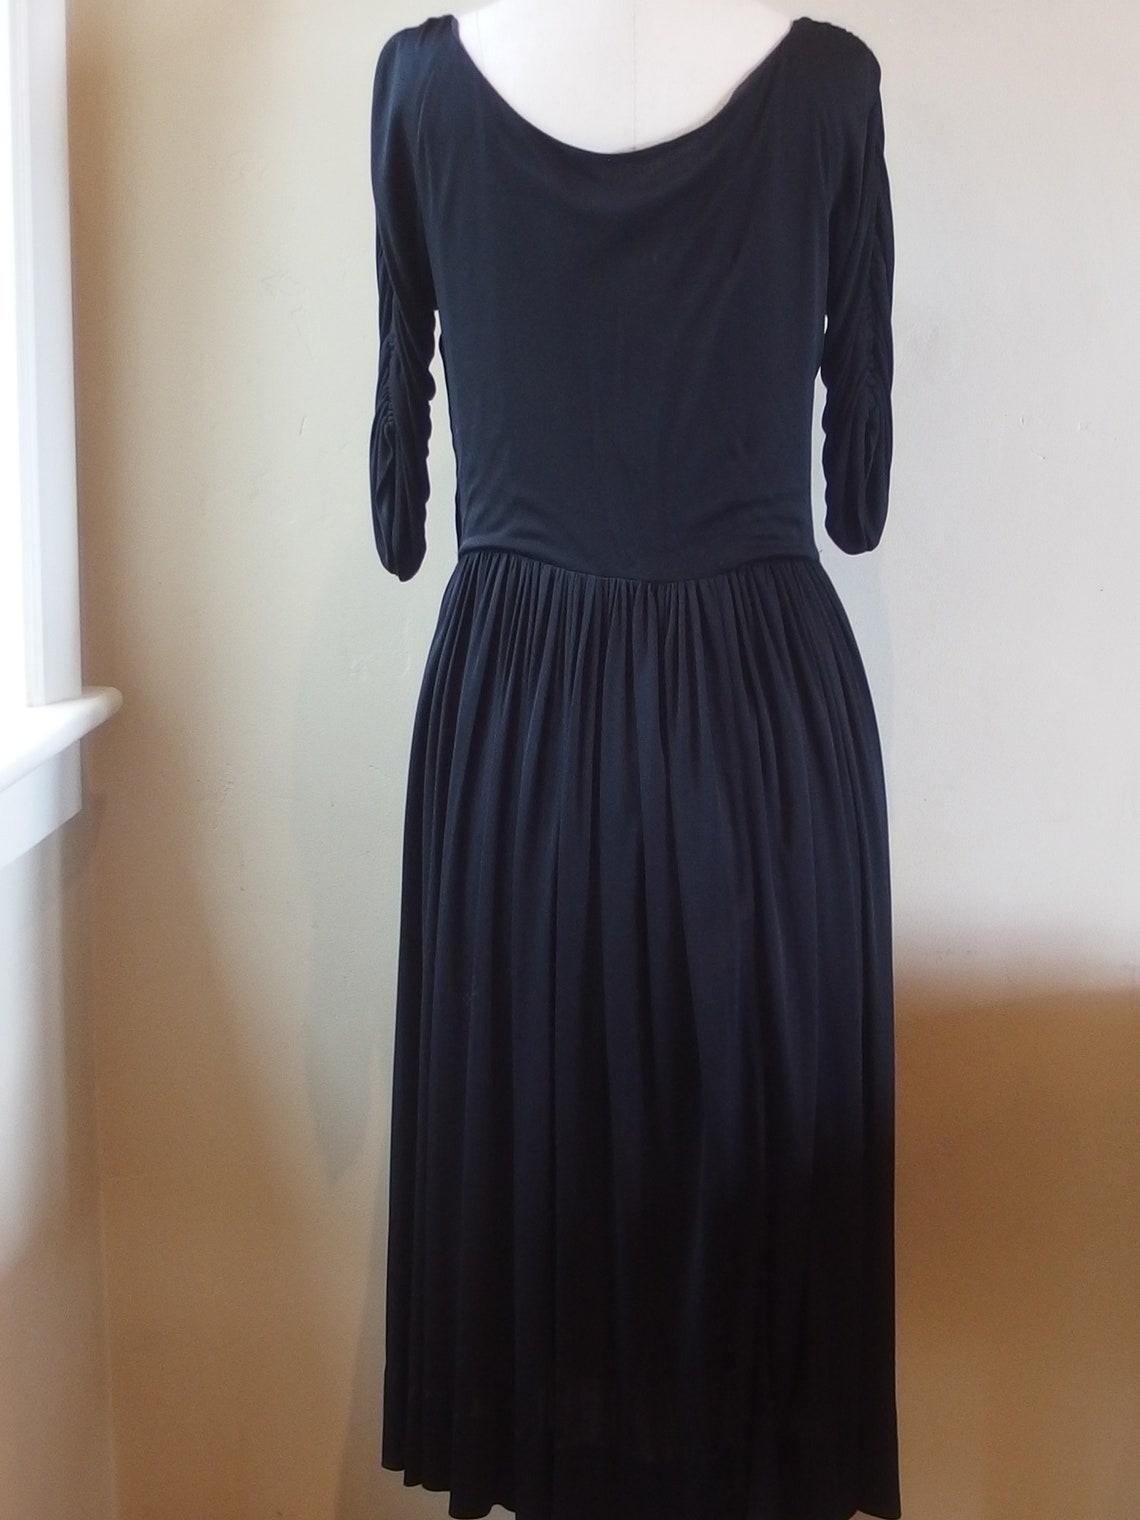 Herbert Sondheim Couture 1950s/60s Black  Crepe Evening Dress